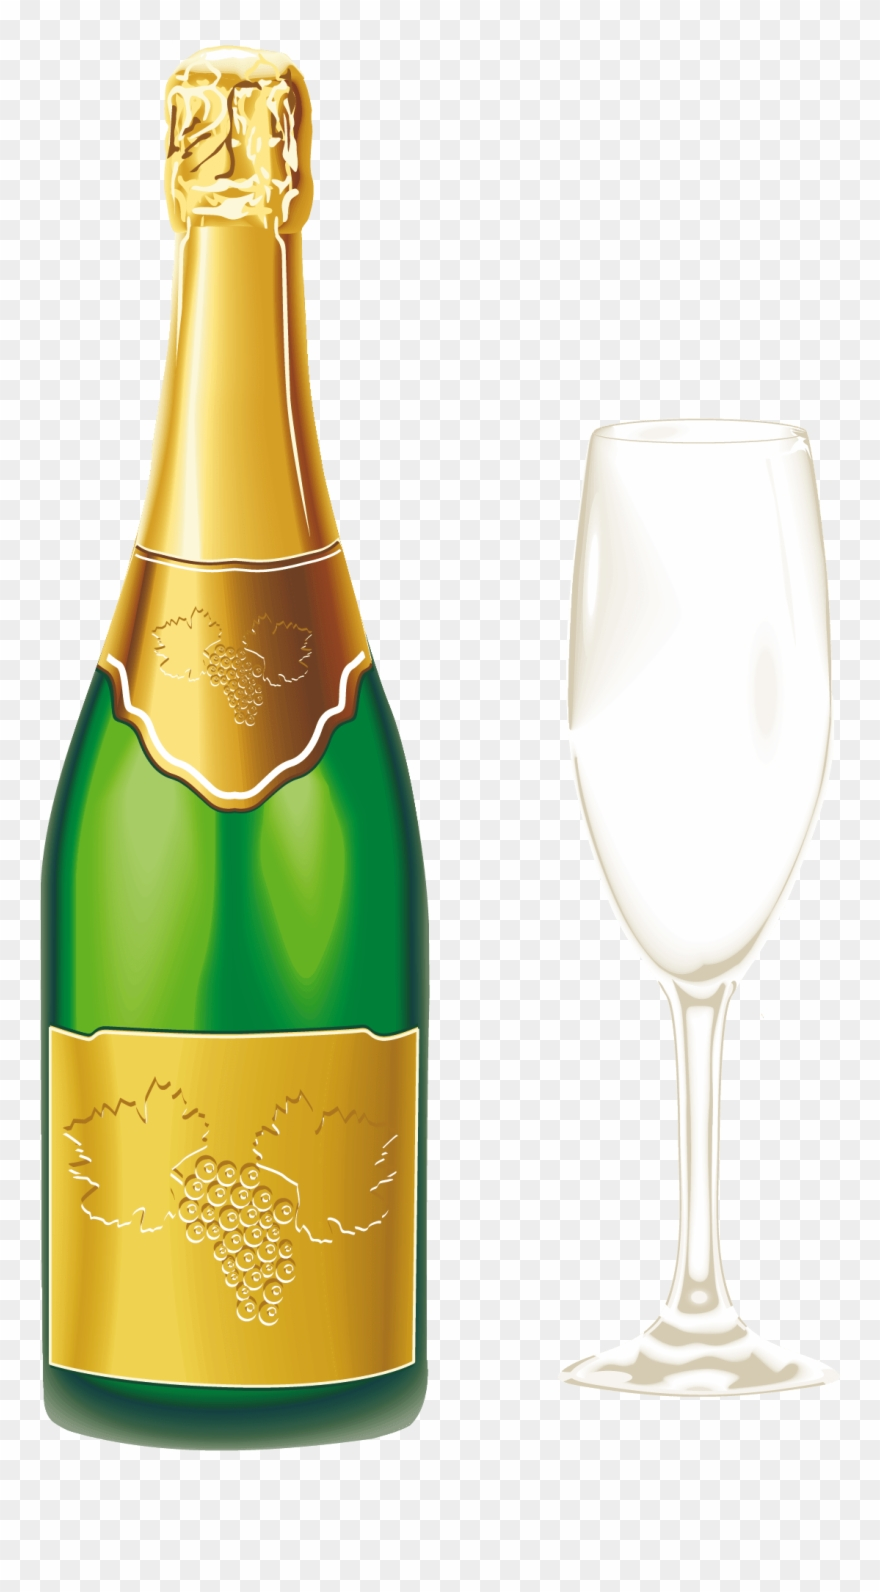 Champaign clipart champagne class. Glass clip art transparent